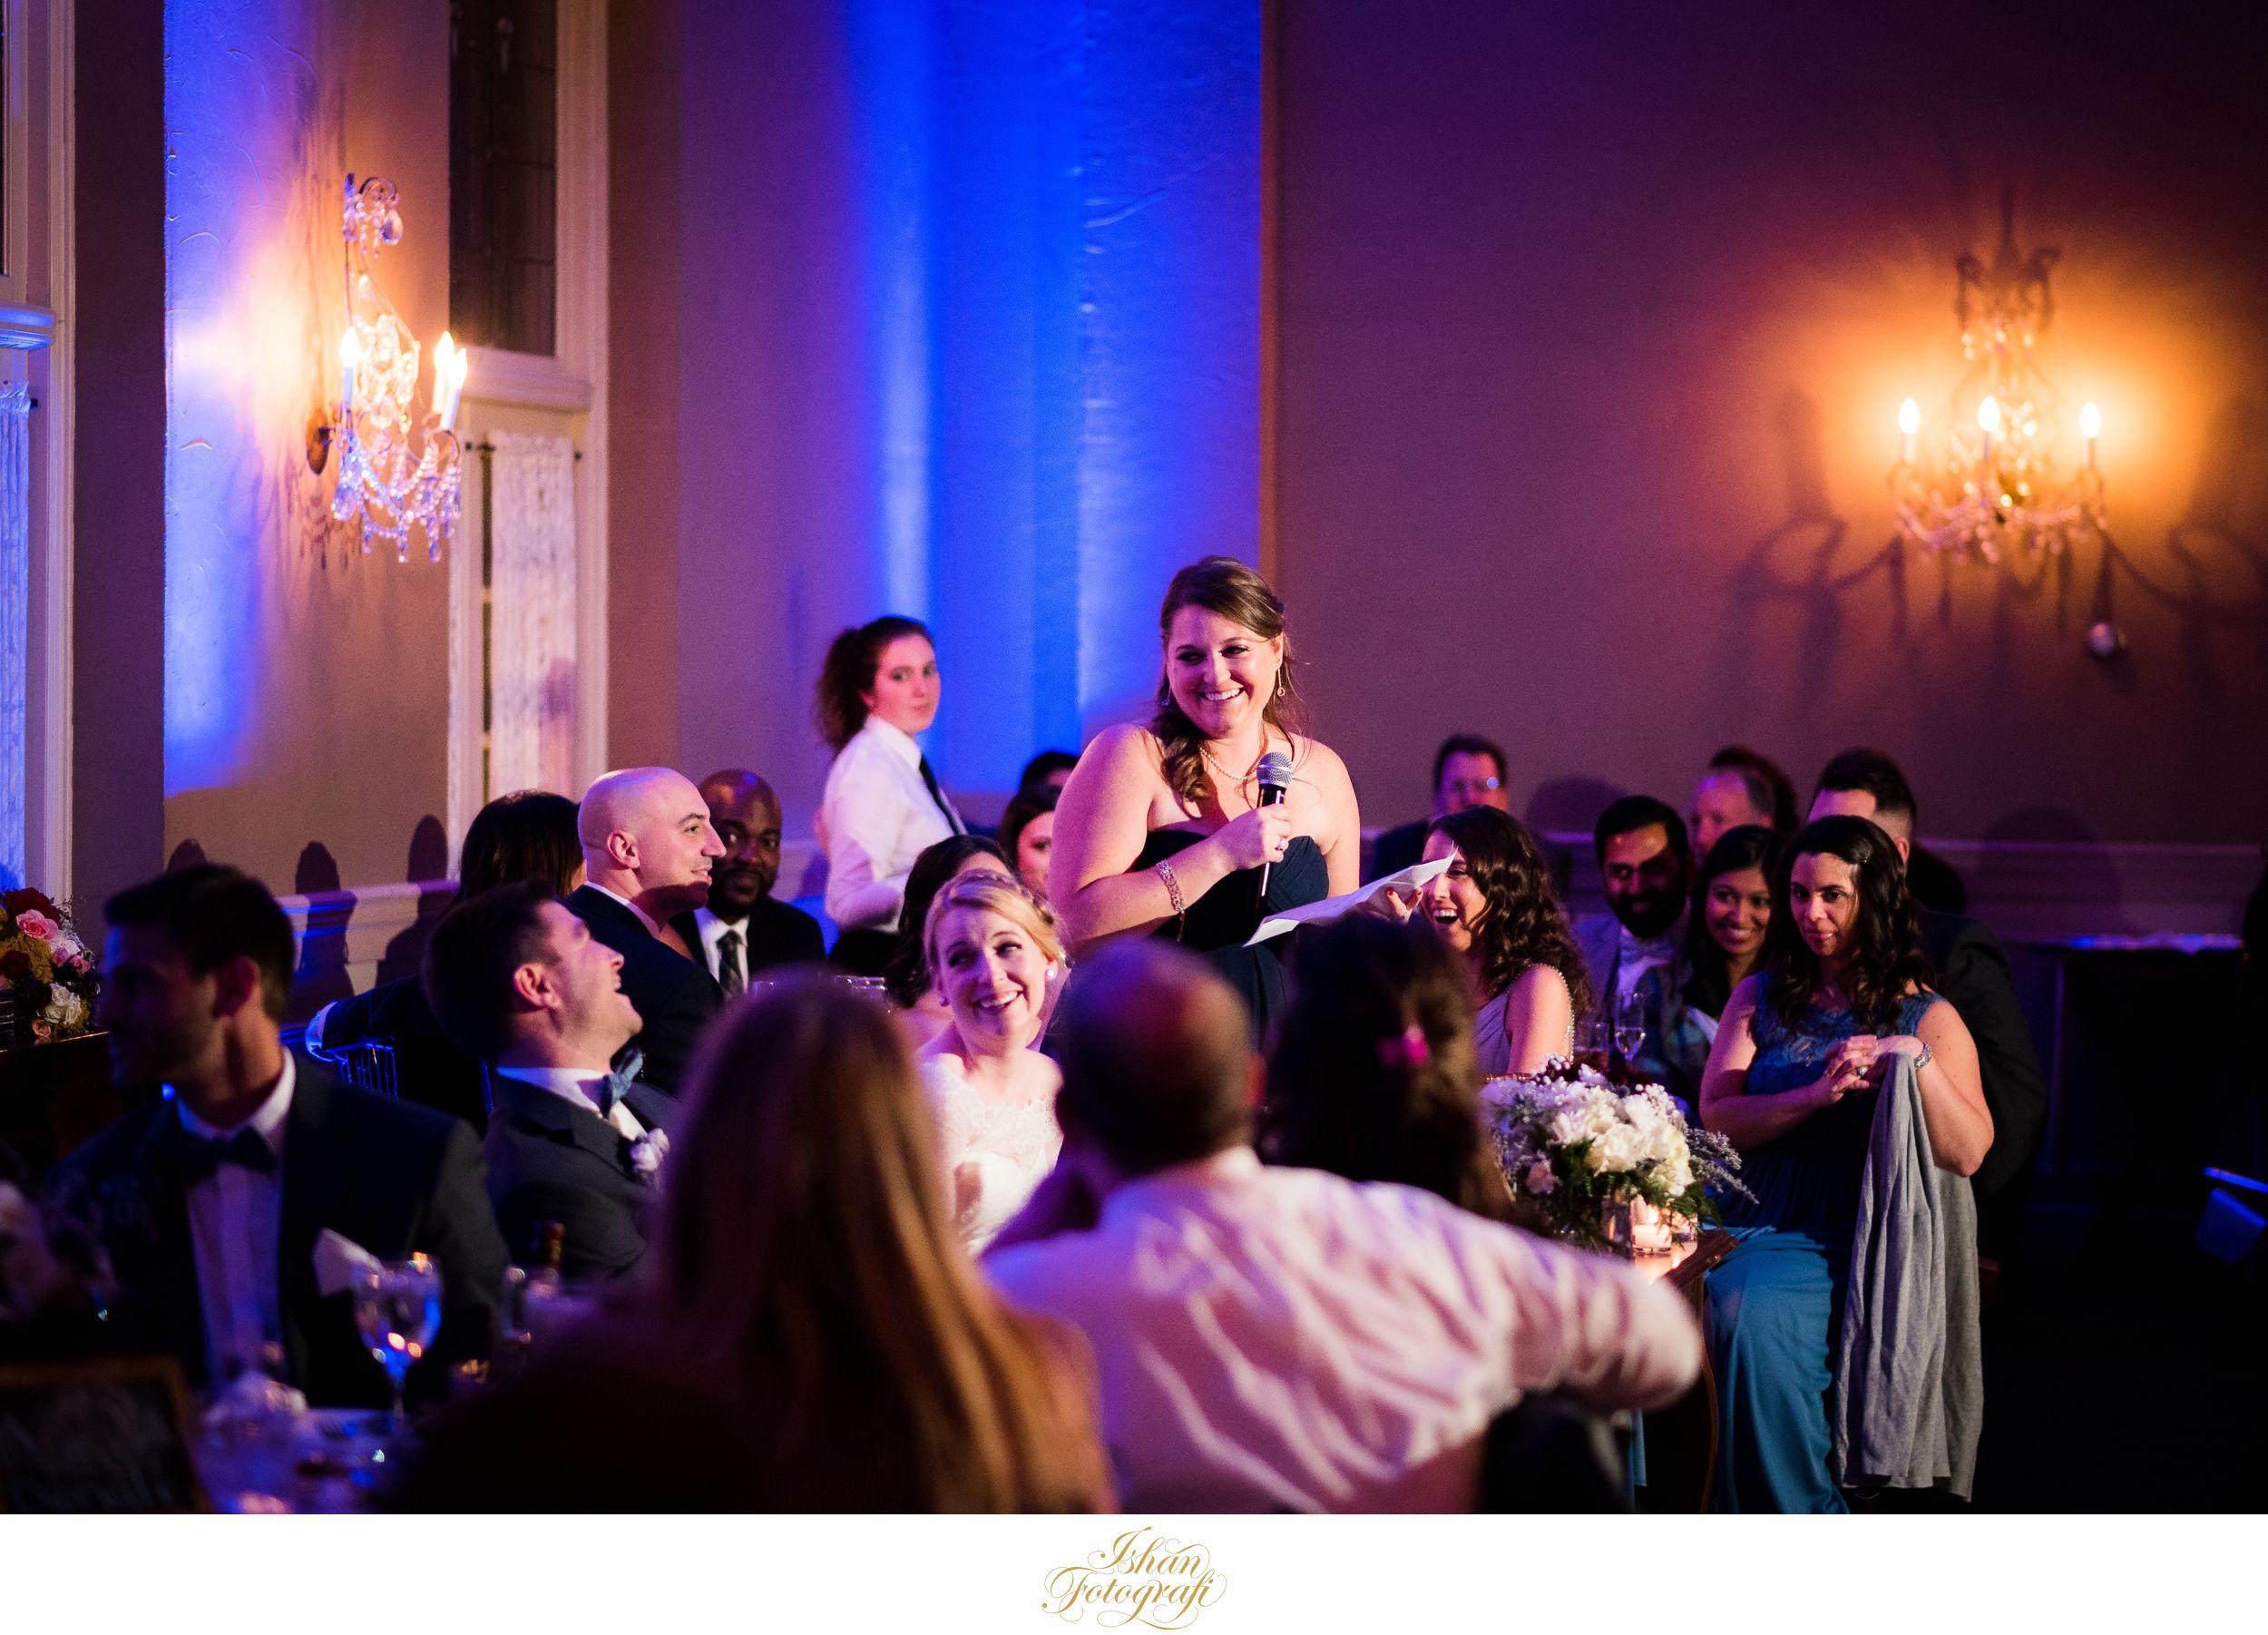 wedding-reception-photo-davids-country-inn-new-jersey